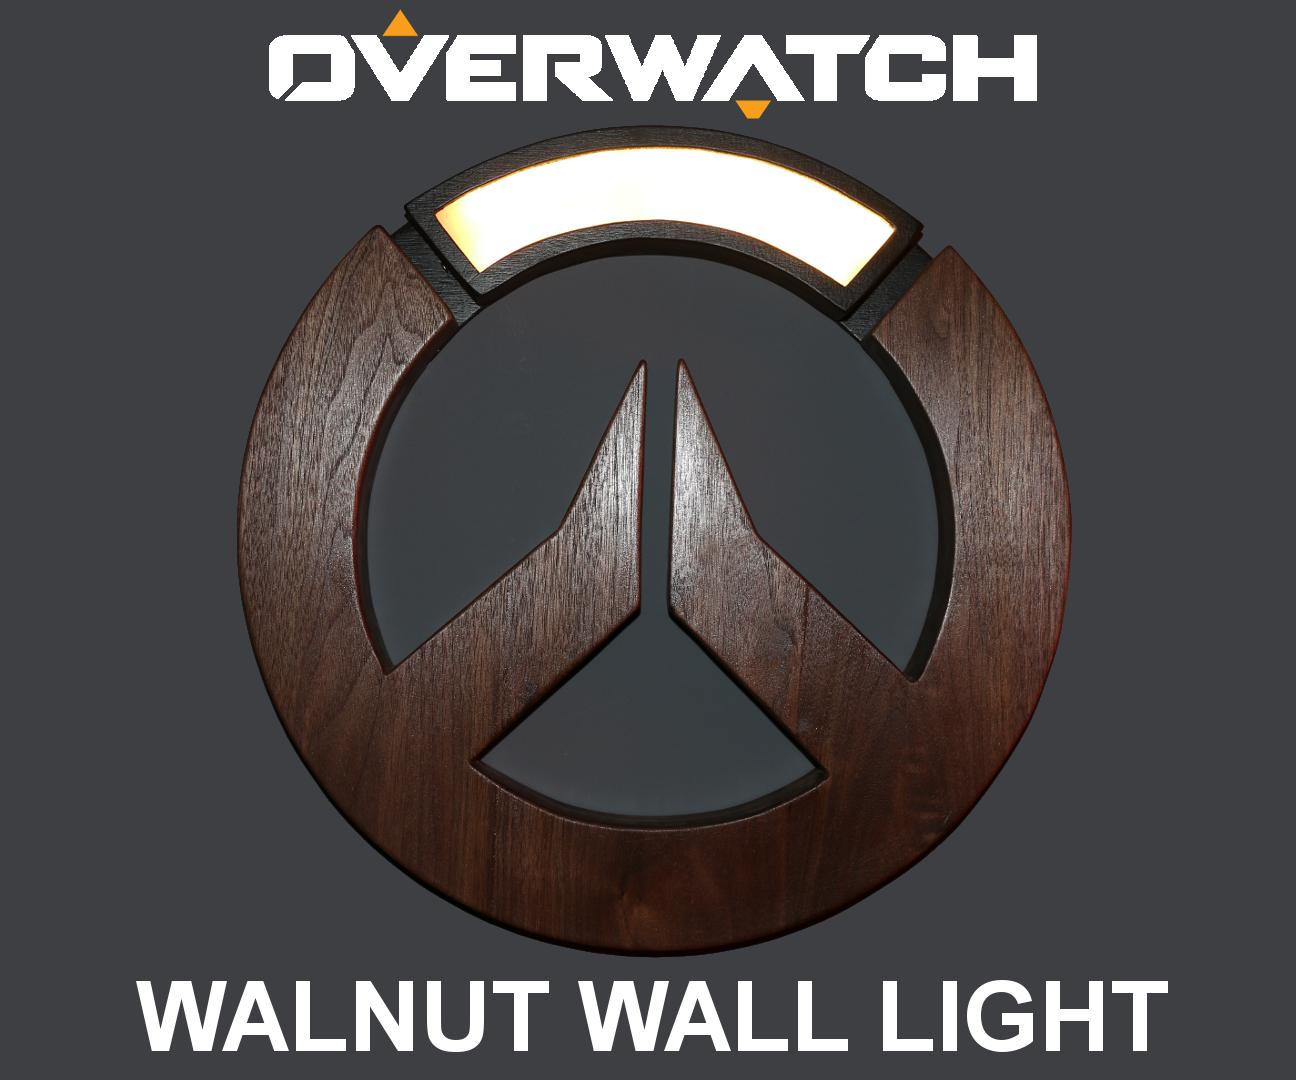 Overwatch Wall Light